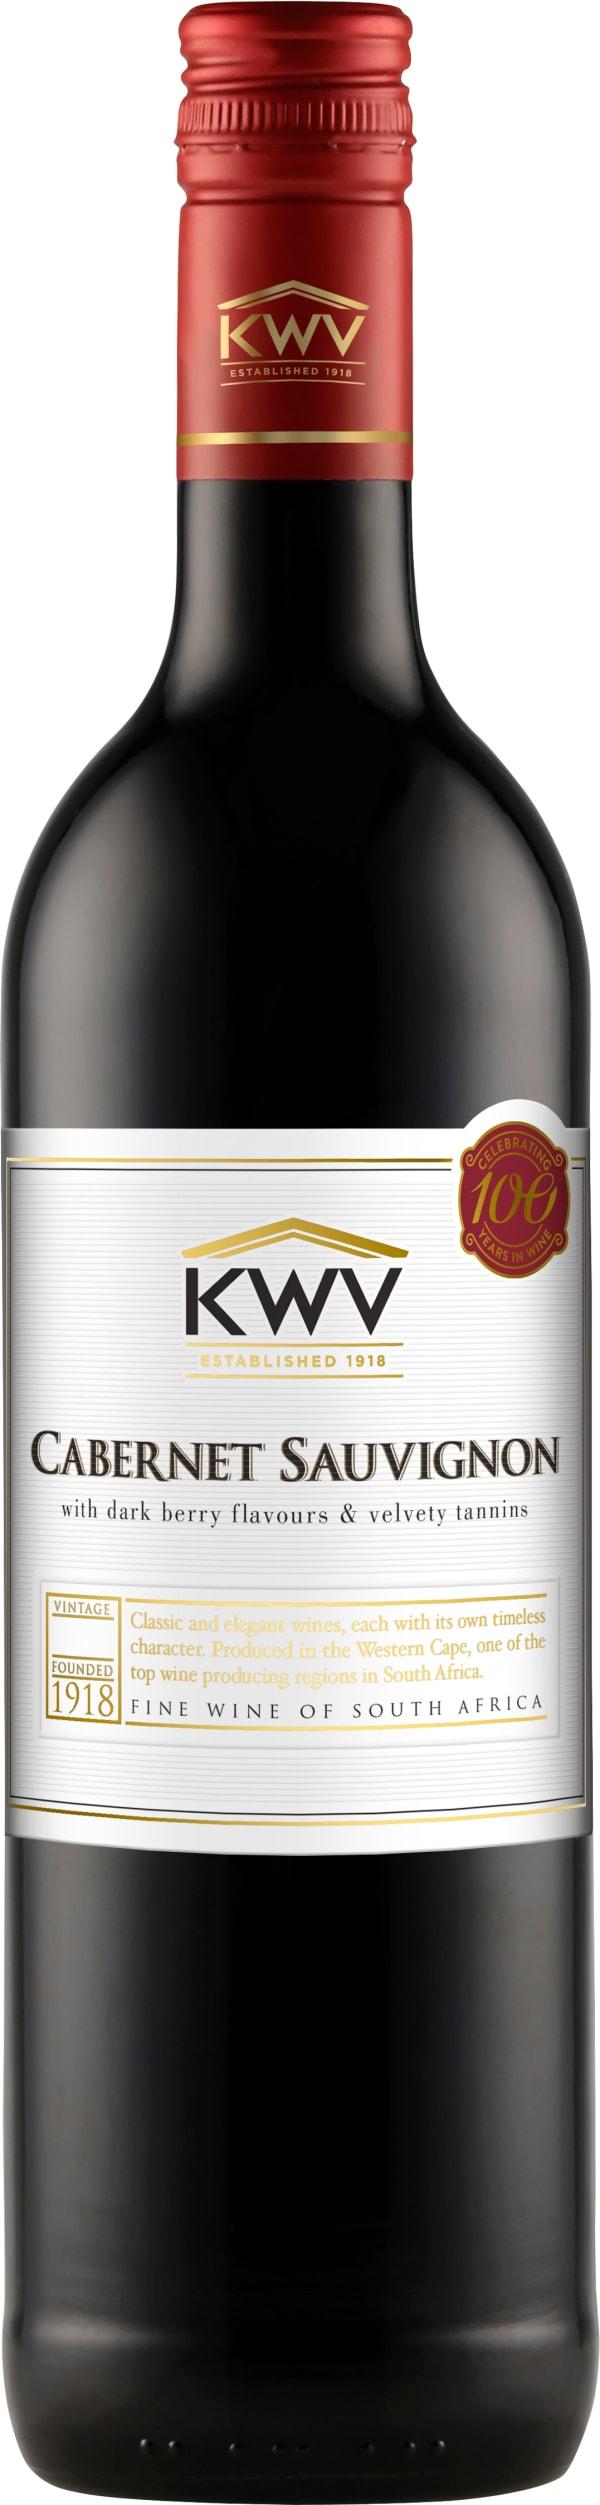 KWV Classic Collection Cabernet Sauvignon 2019